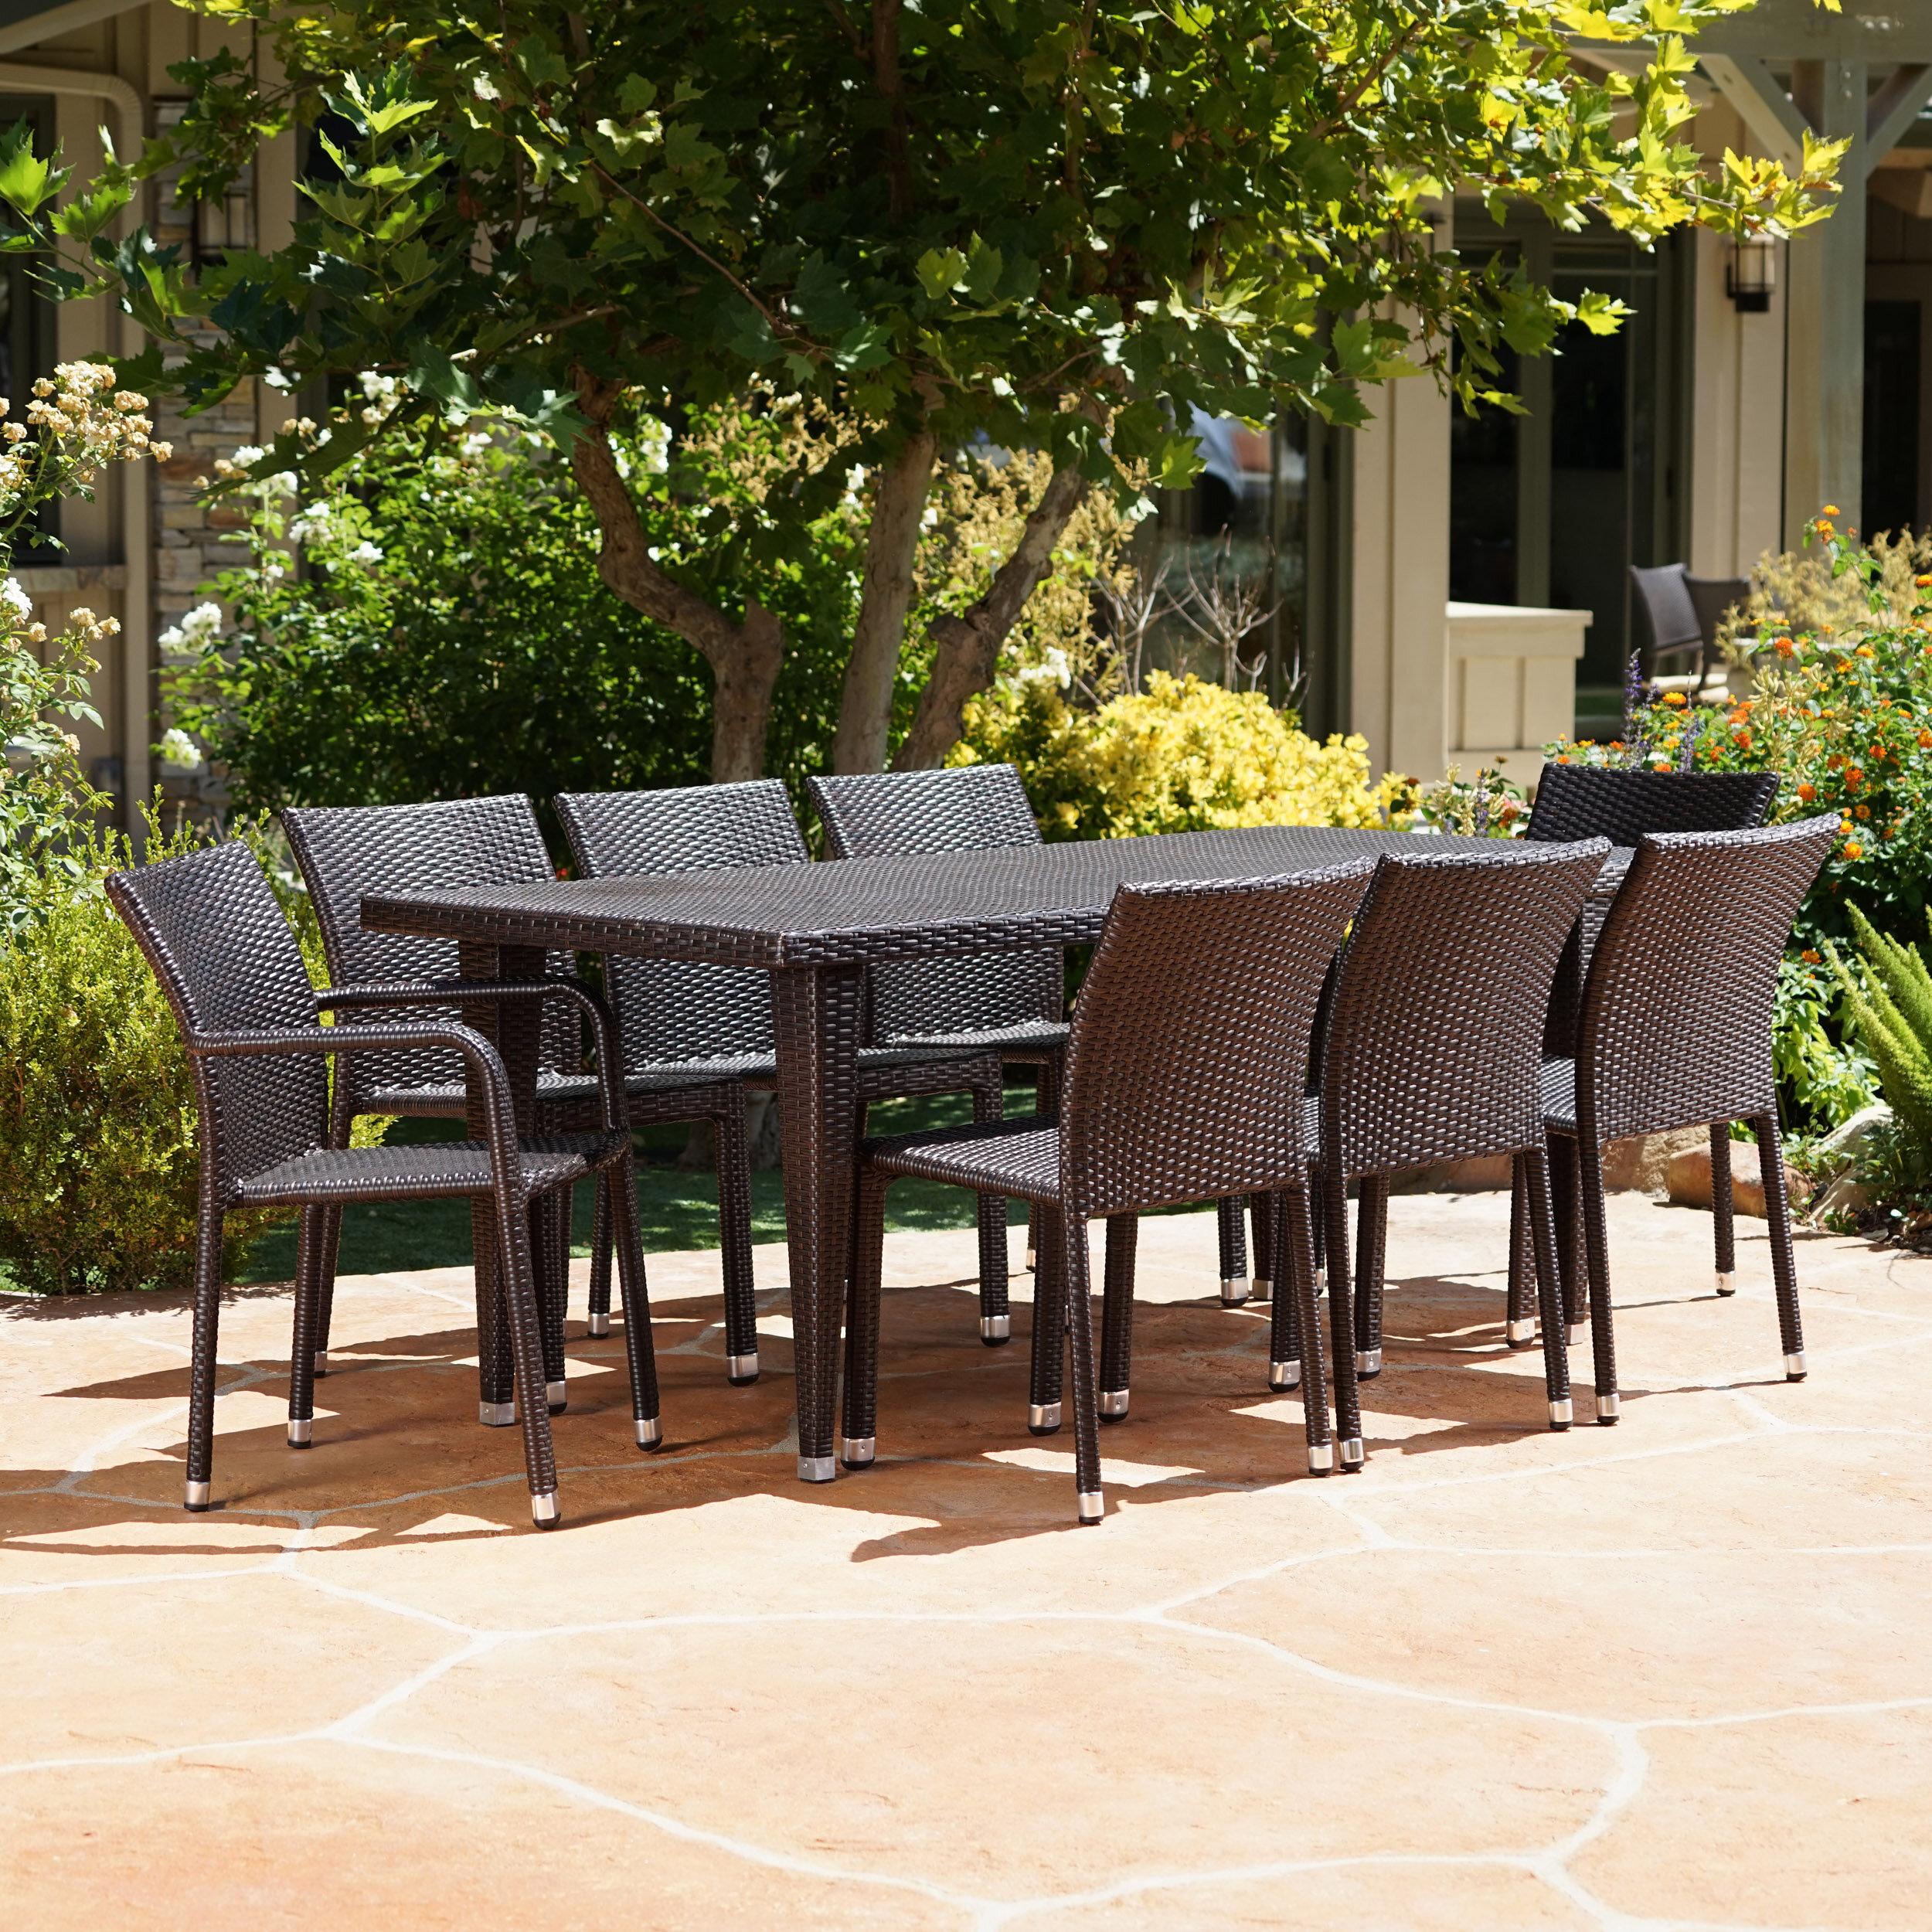 Fabulous Kaila Outdoor 9 Piece Dining Set Cjindustries Chair Design For Home Cjindustriesco